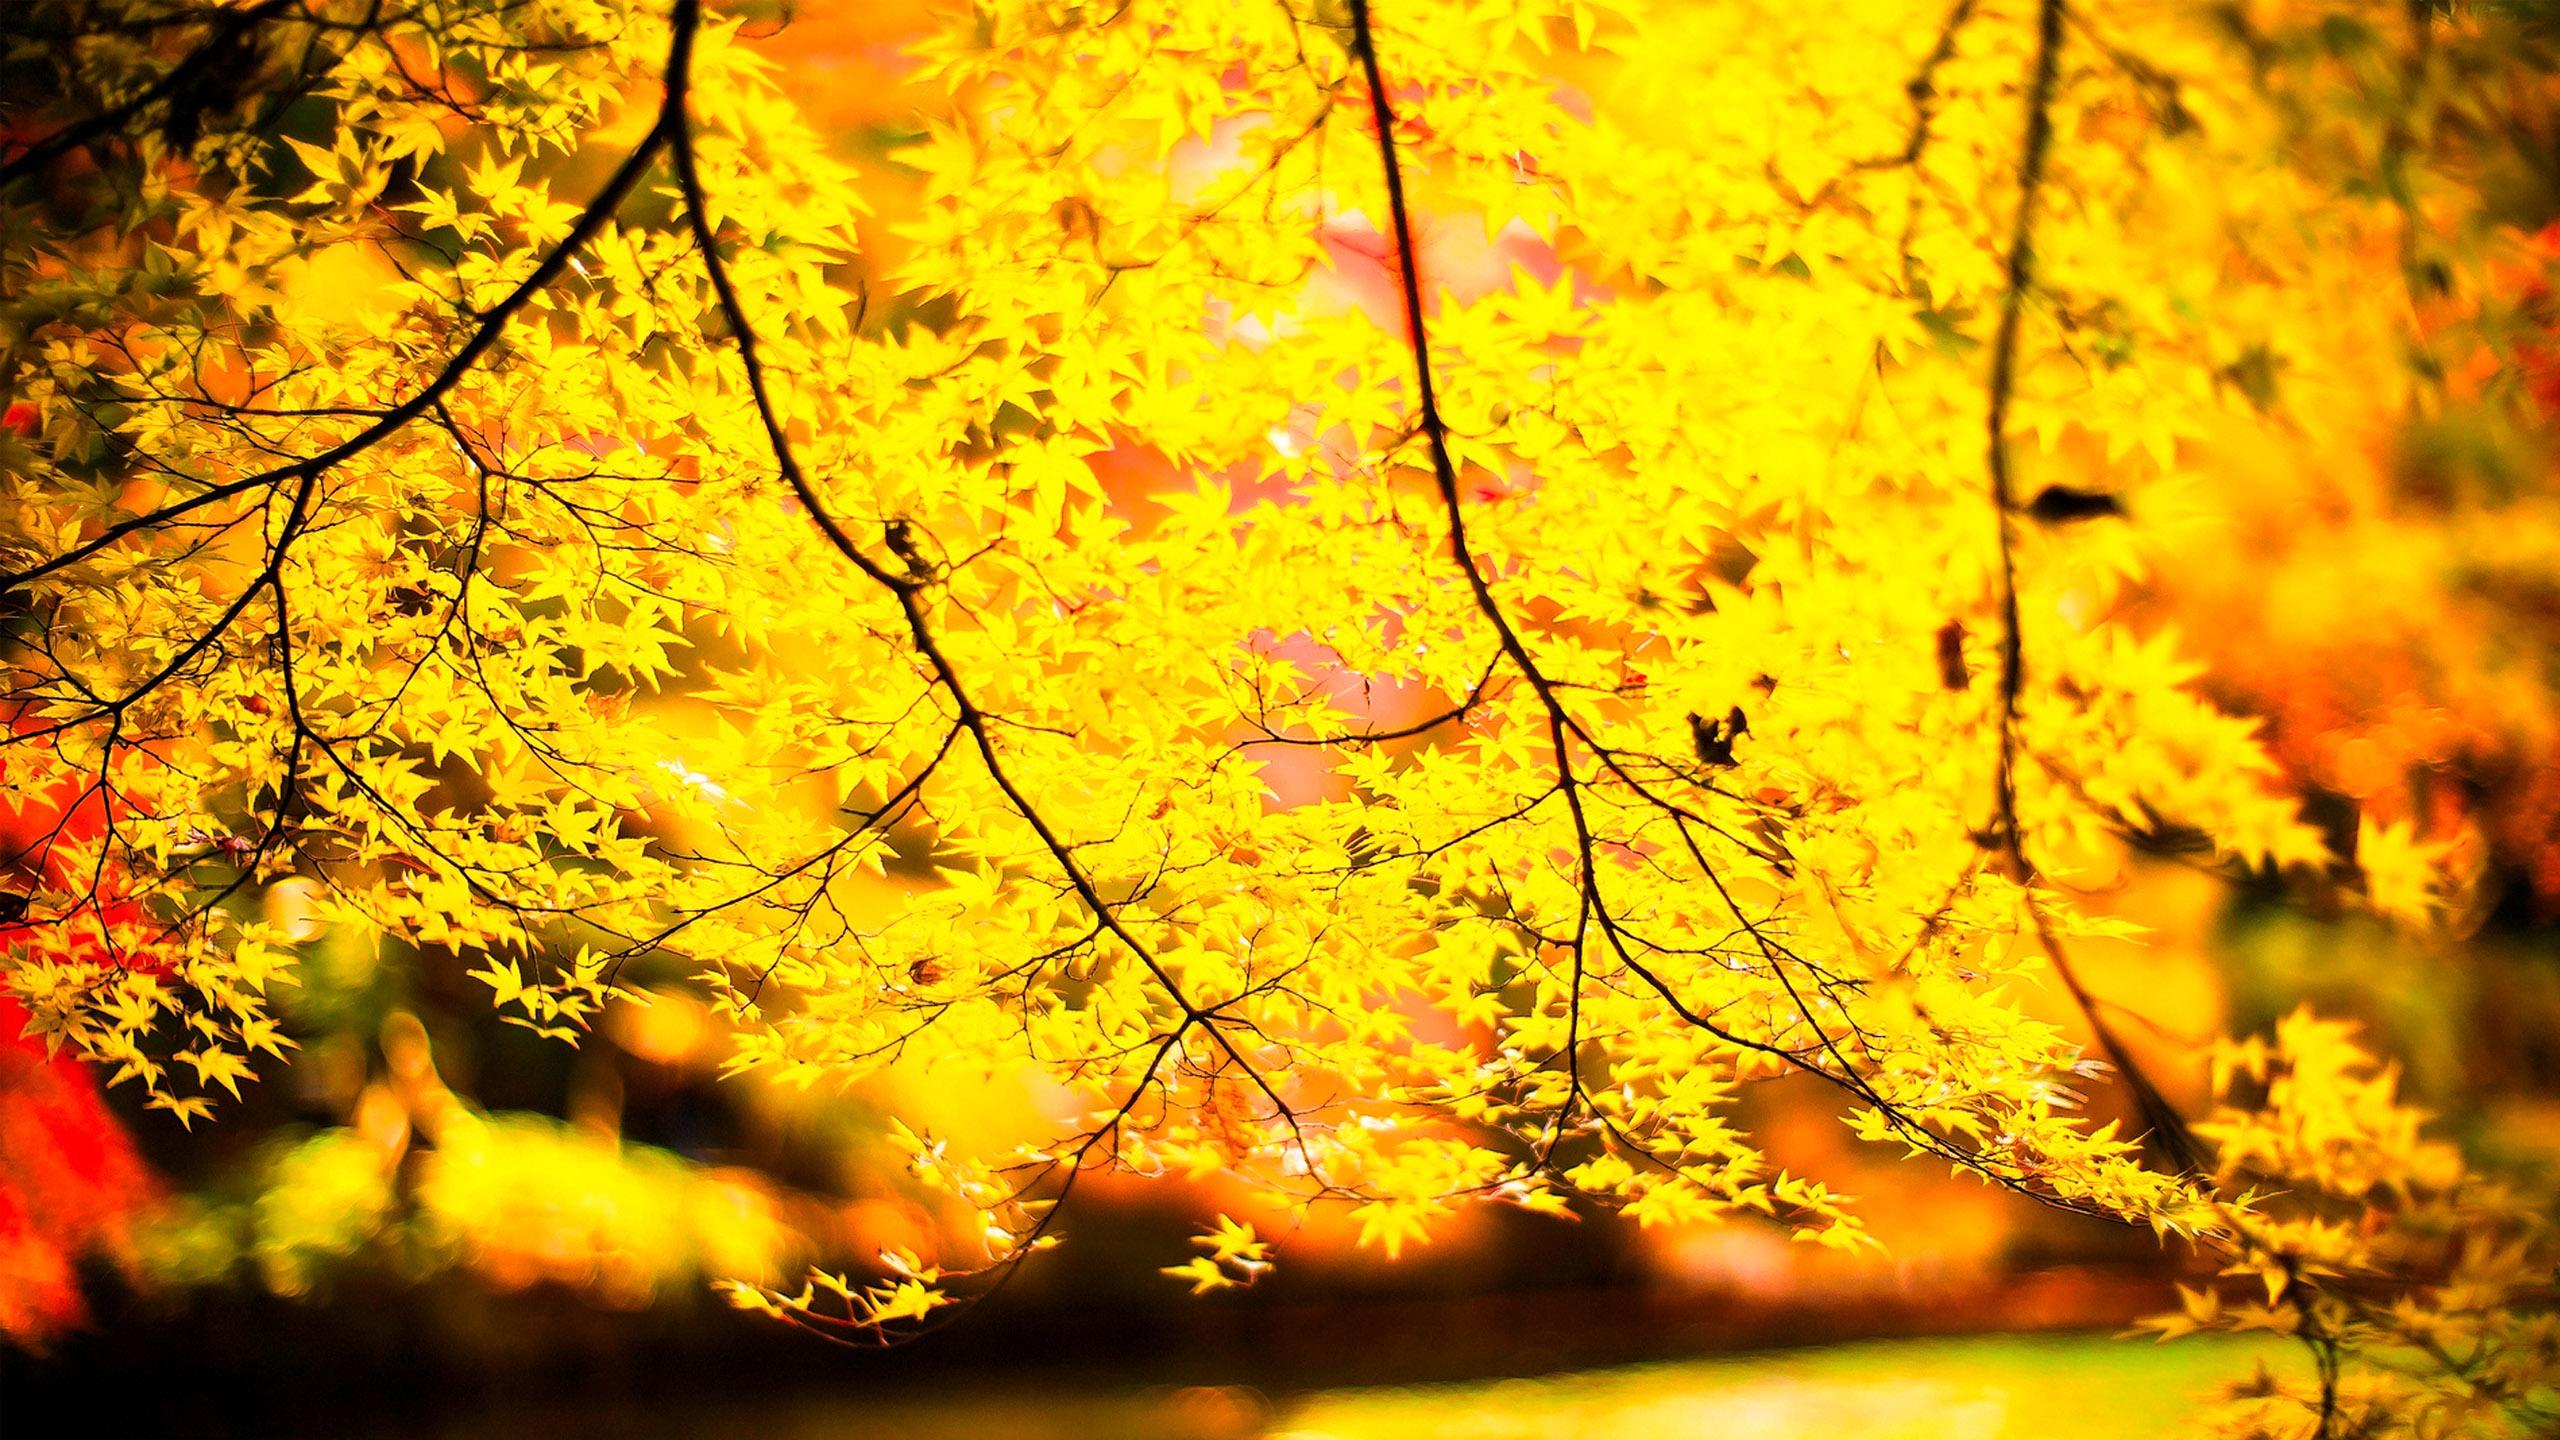 BNeon Yellow B Backgrounds